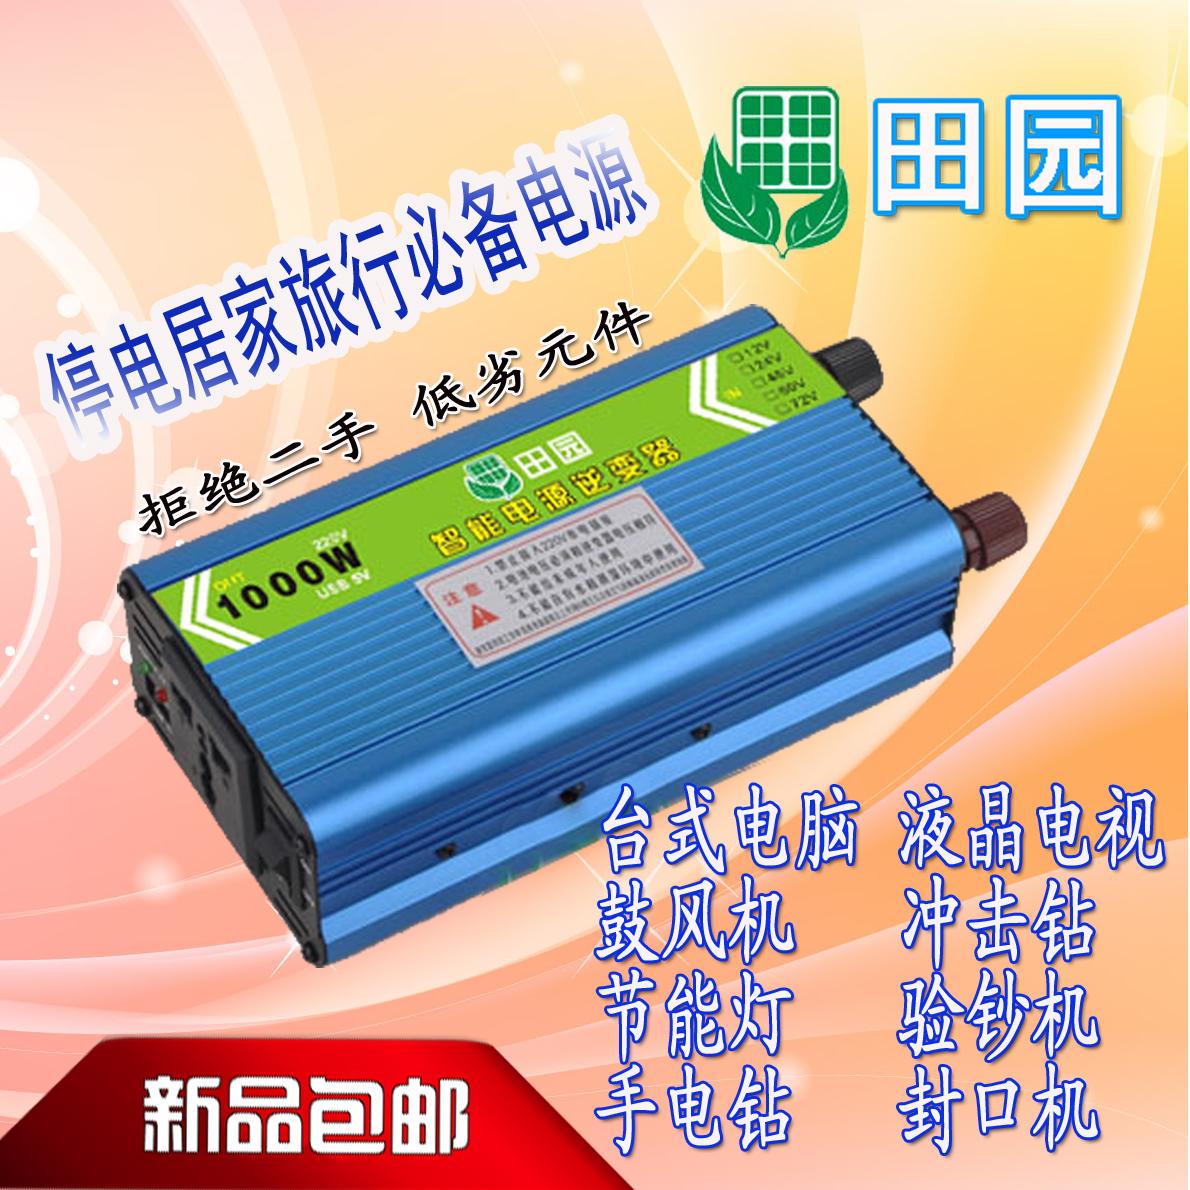 220v电源挅�.��kh�^k9P_220v转12v电源转化器